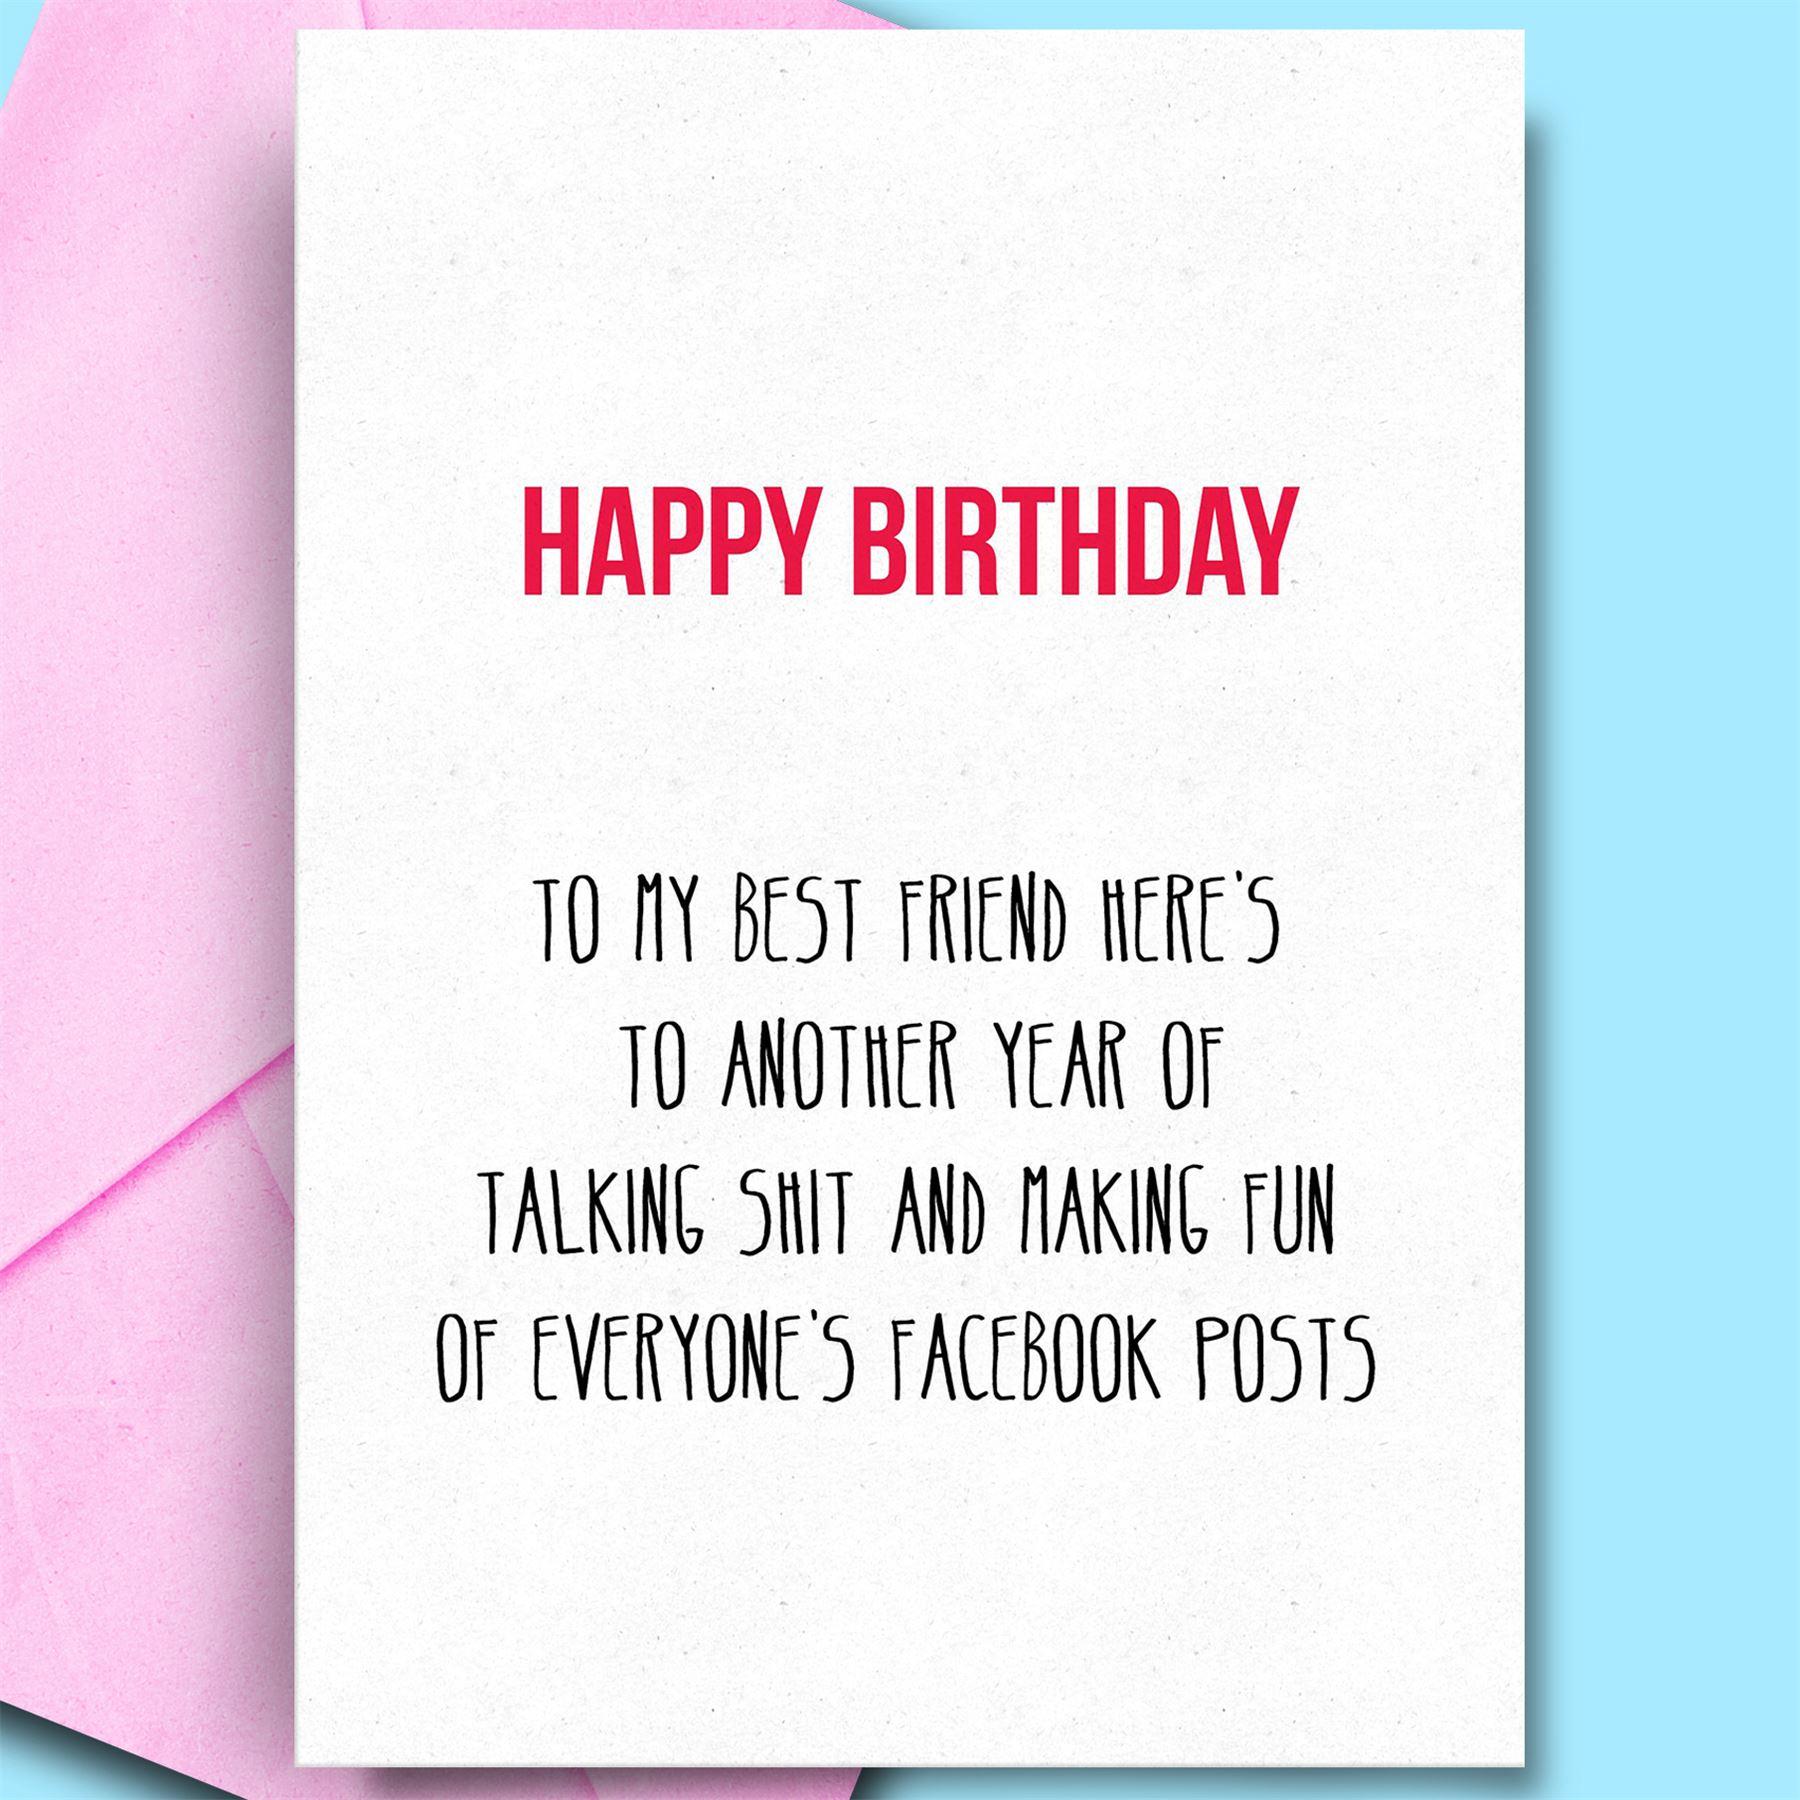 happy birthday card for mum boyfriend brother sister rude